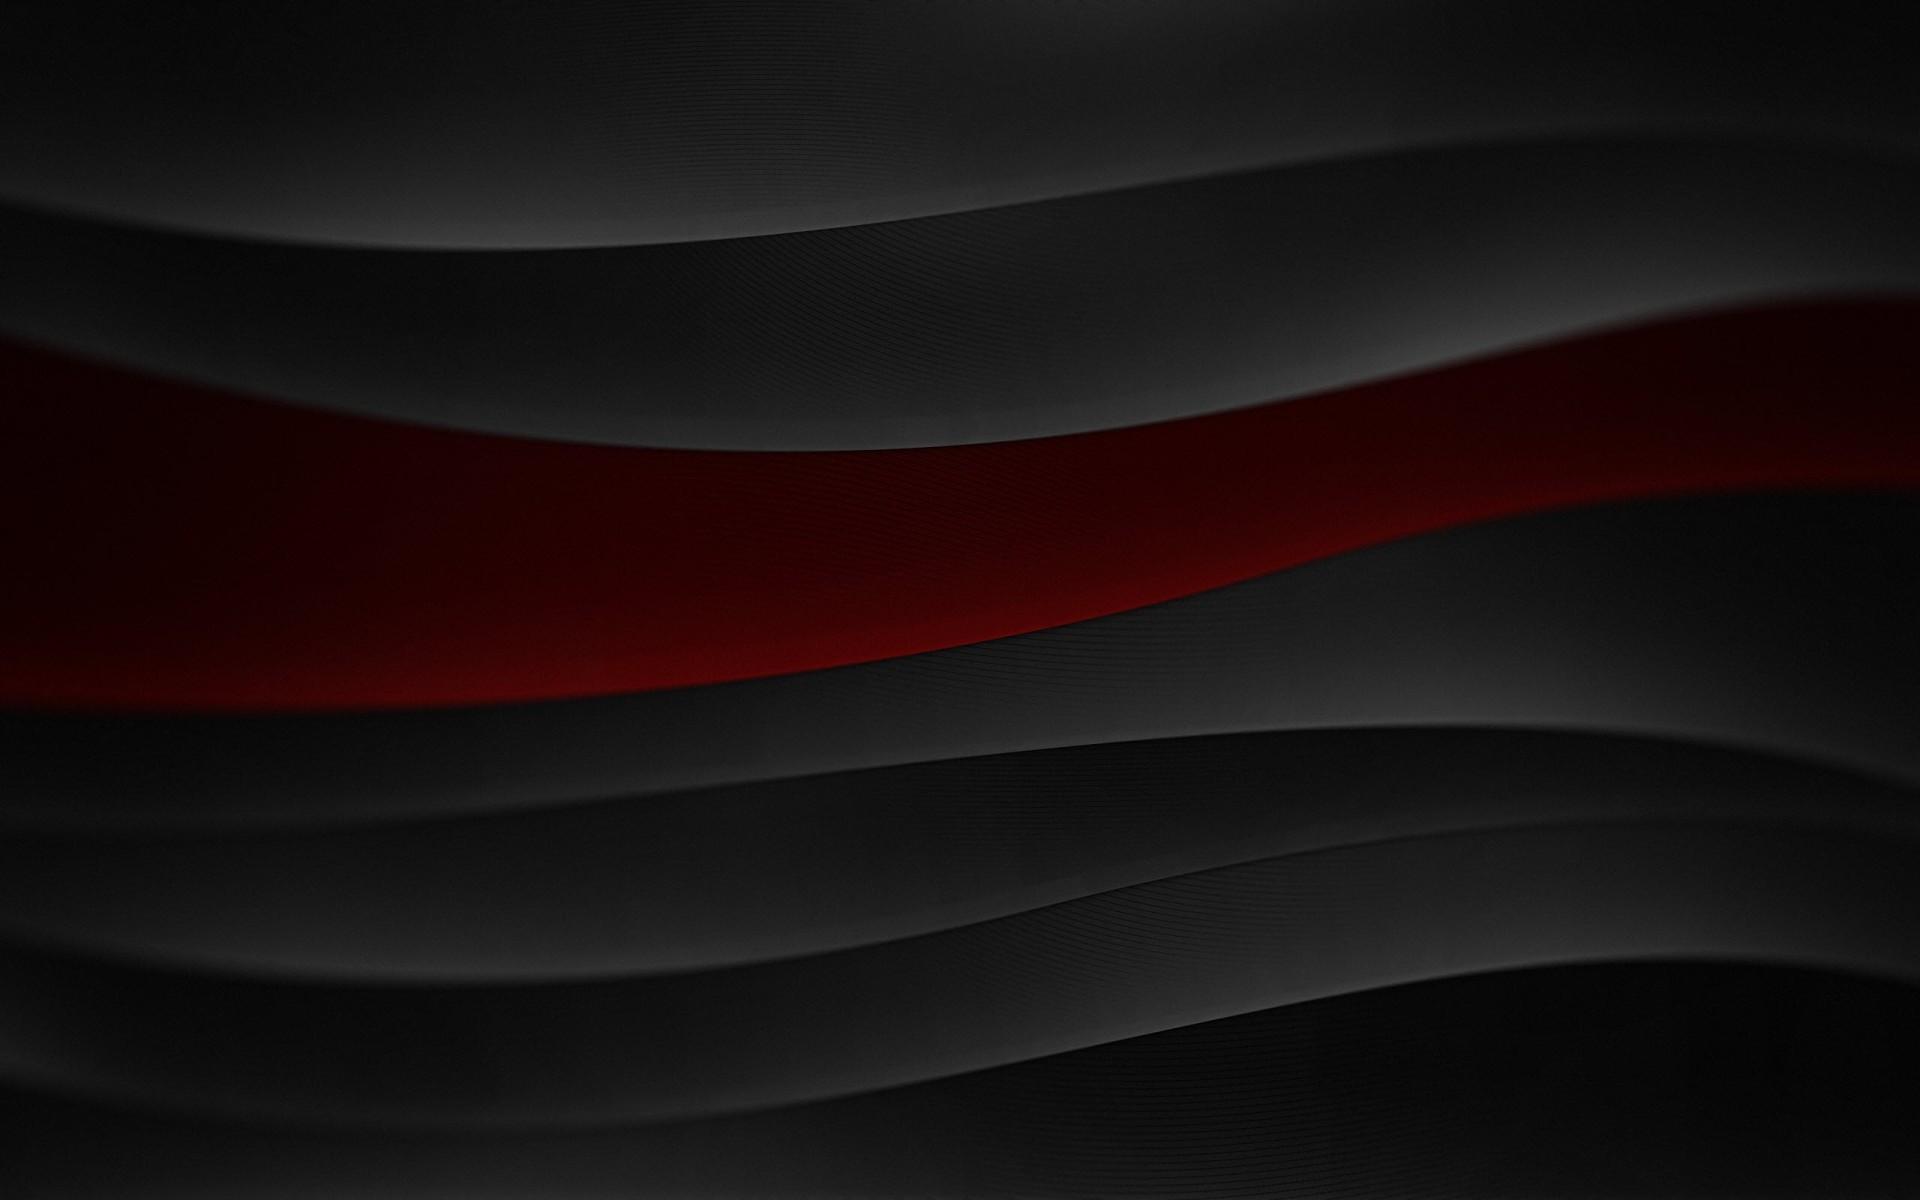 Black leather wallpaper – 1056596 | Wallpaper Hd | Pinterest | Black leather  and Wallpaper